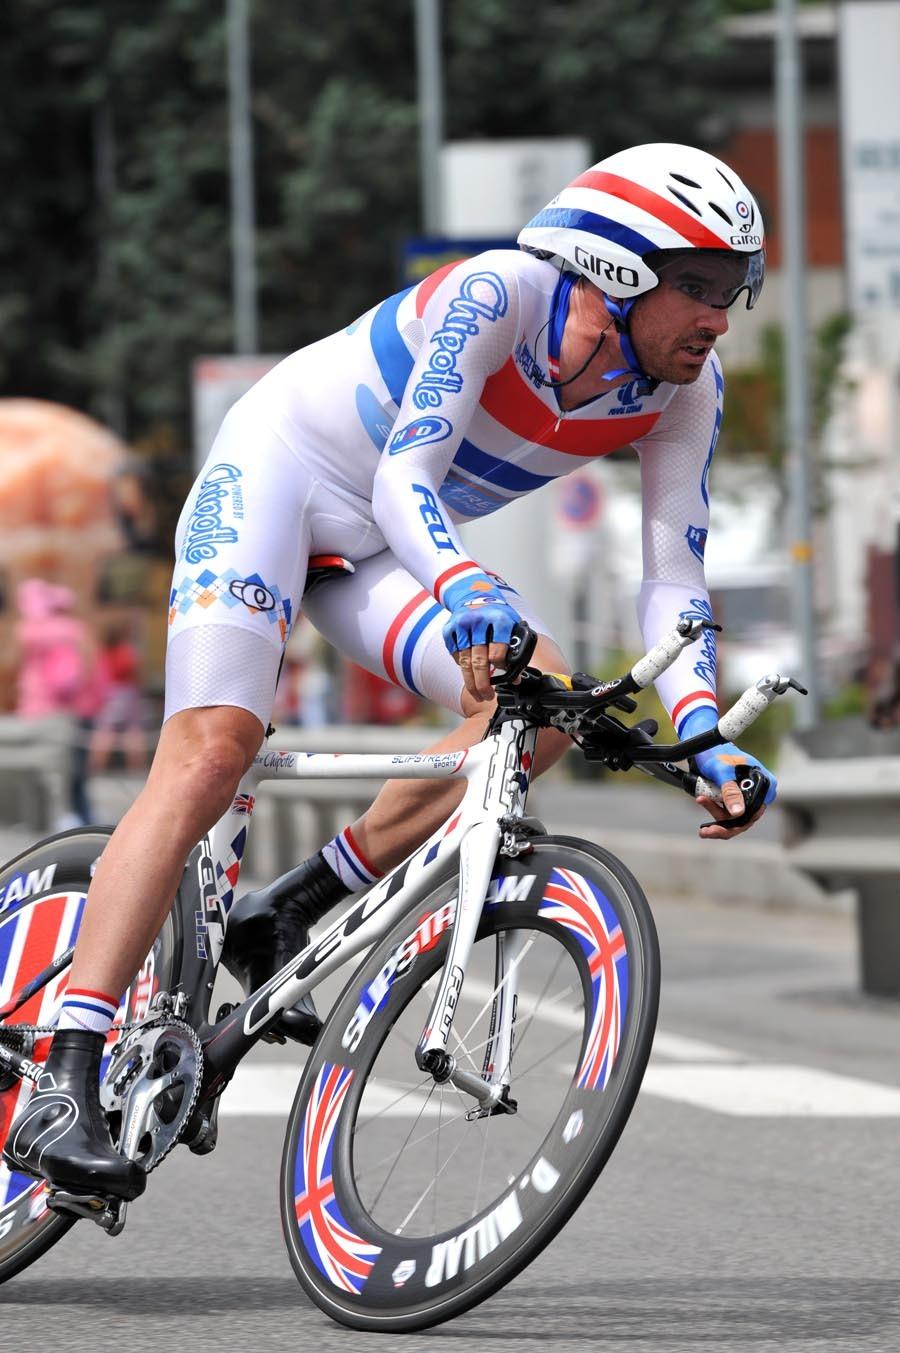 Giro 2008 stage 21